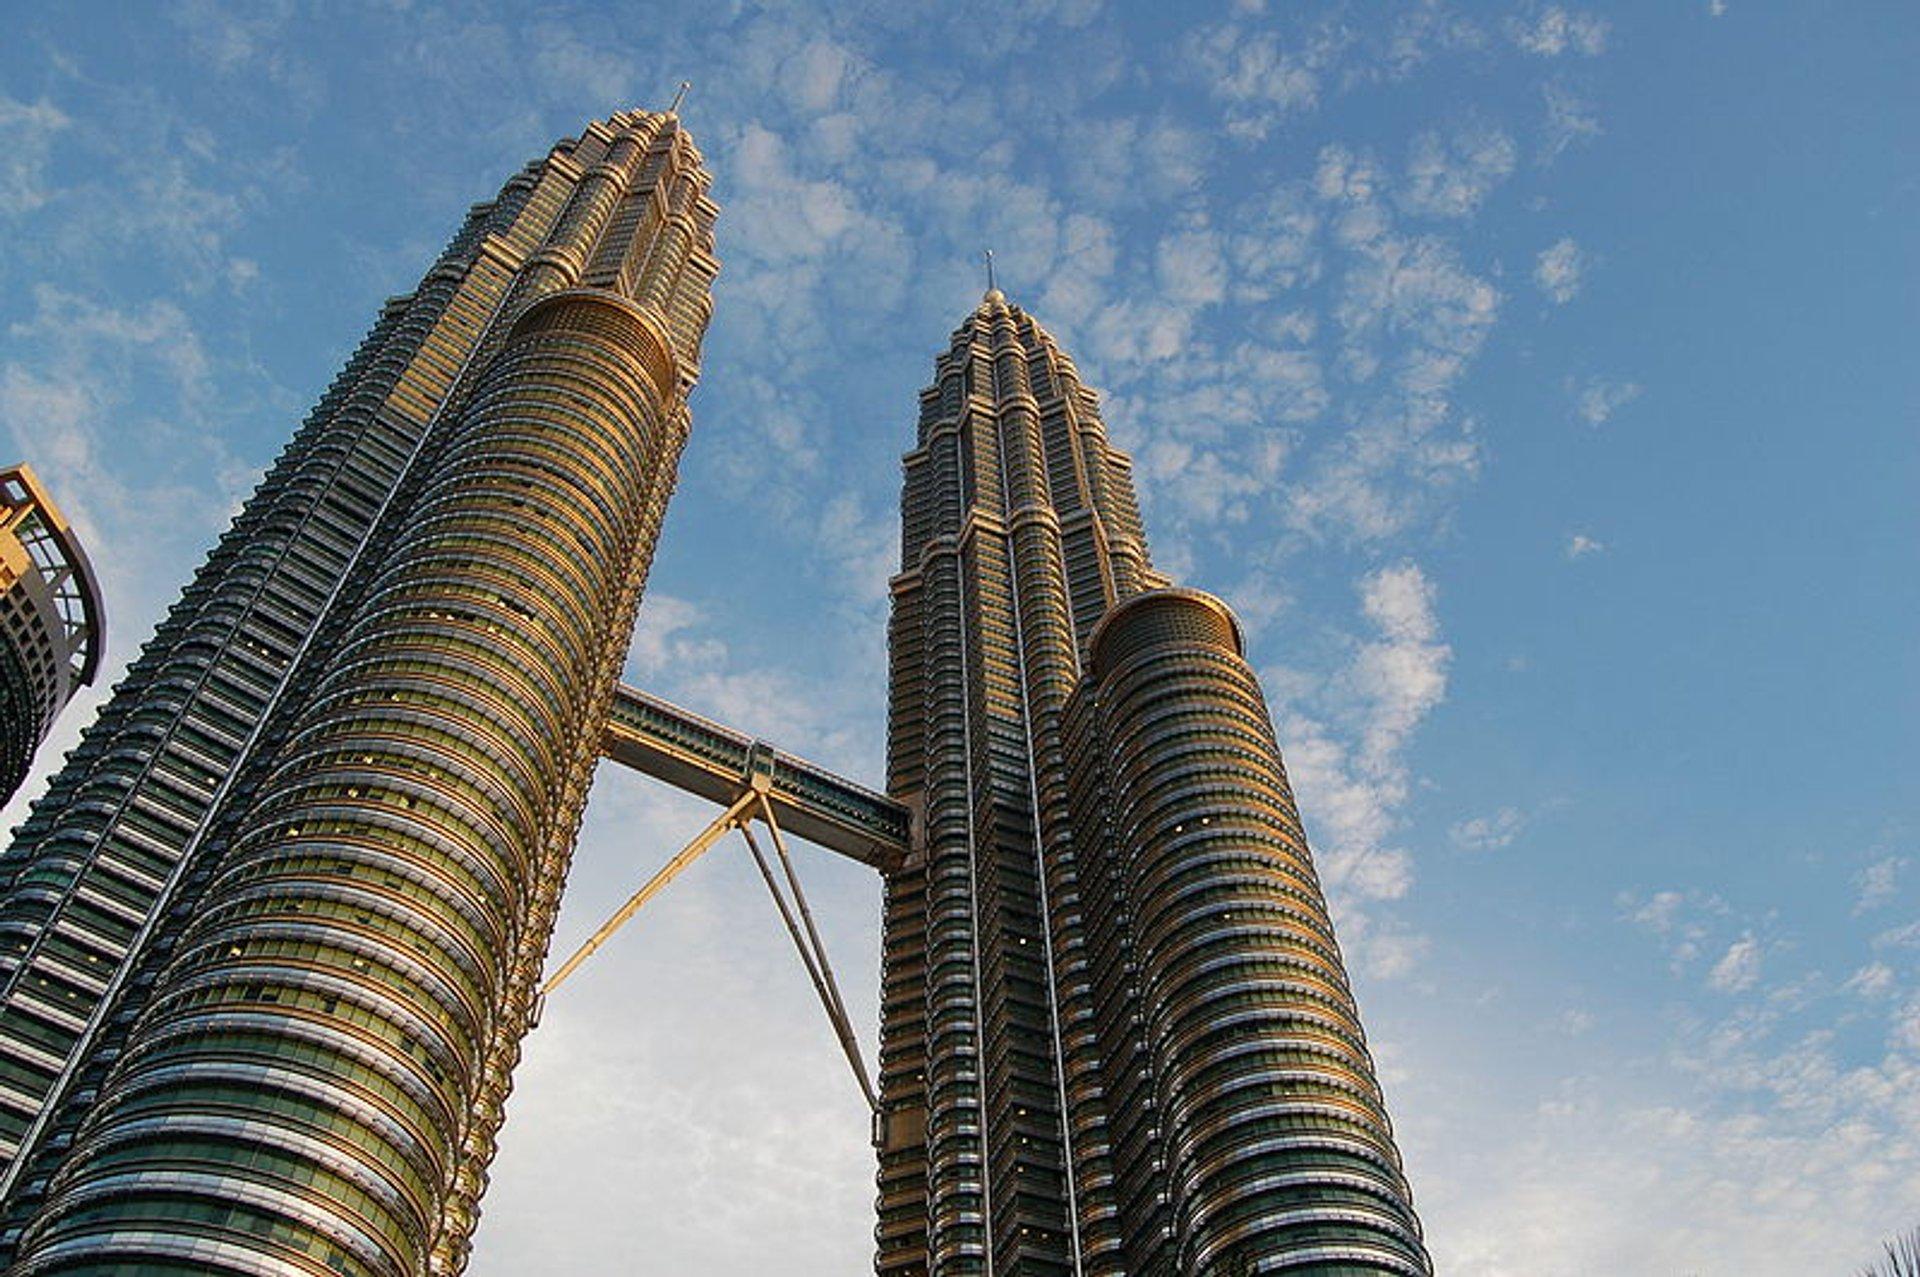 Best time to see Petronas Twin Towers in Kuala Lumpur 2019